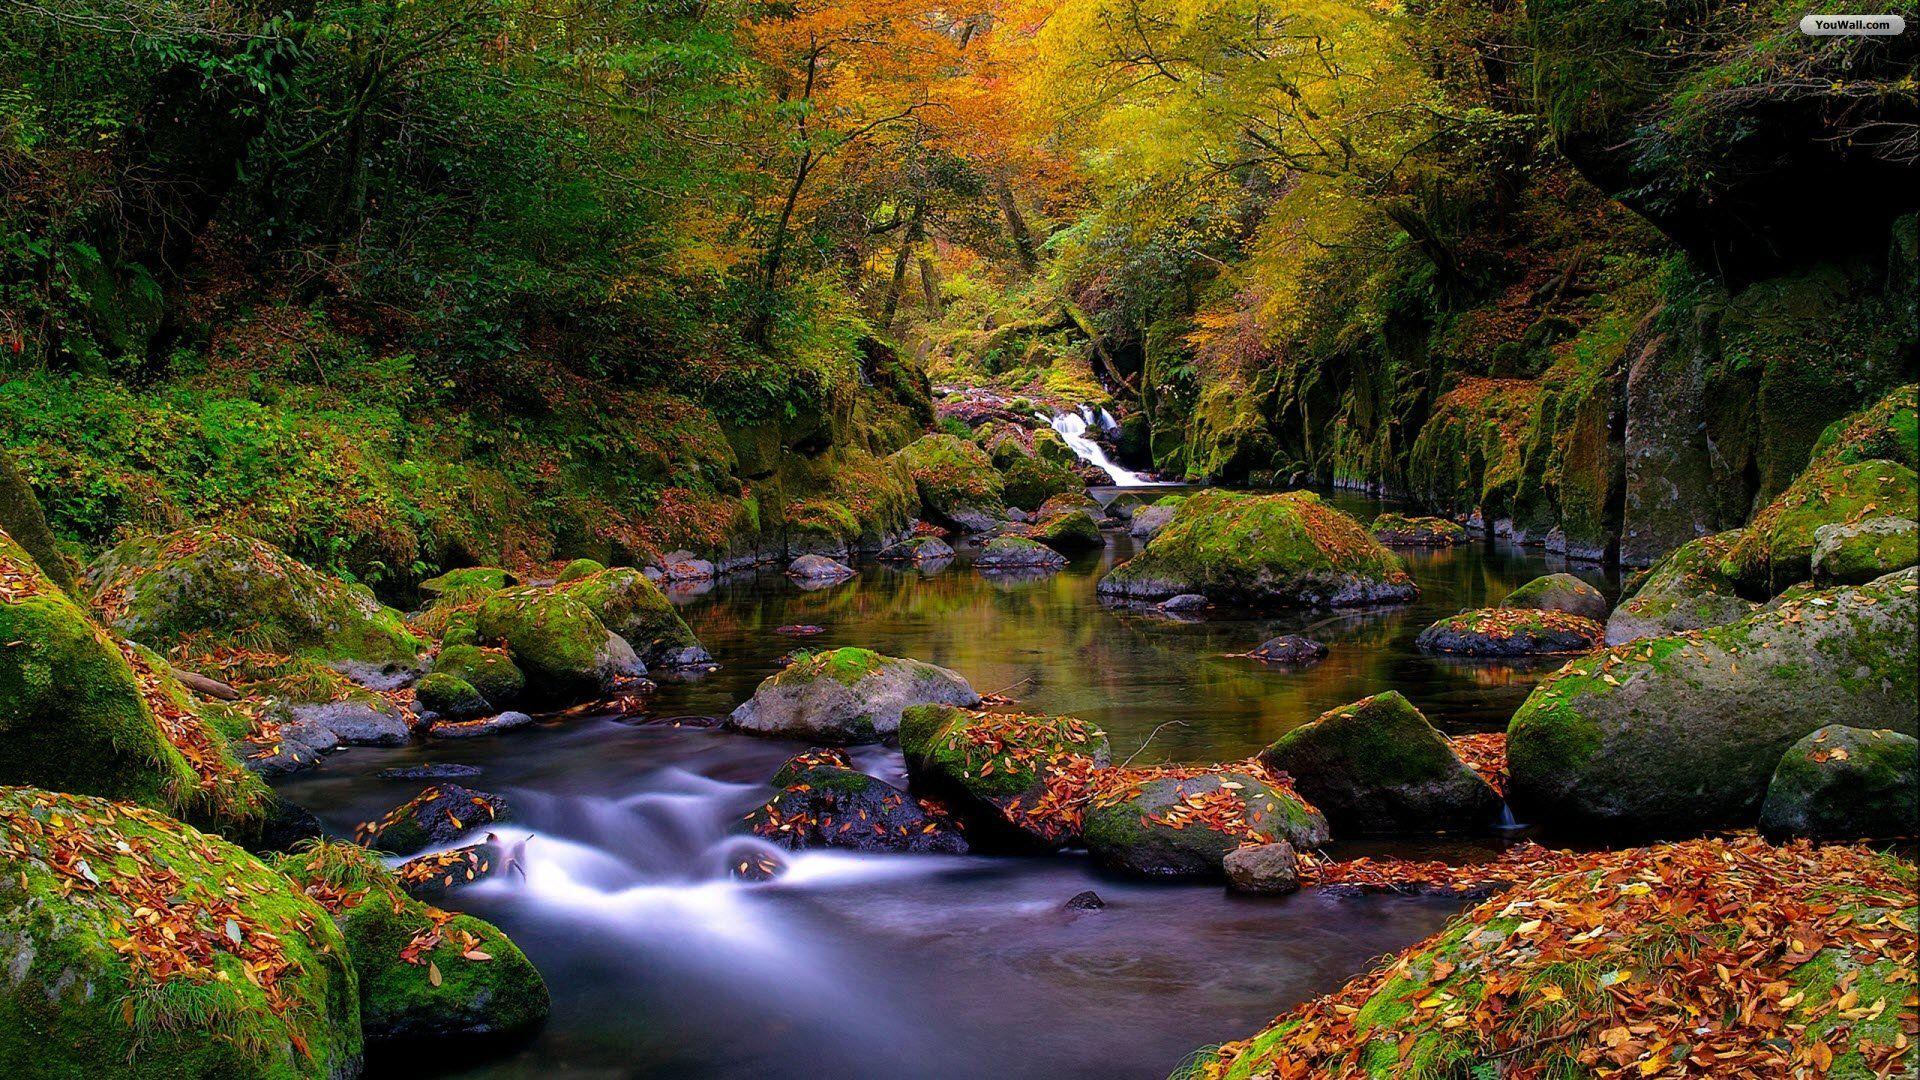 Autumn Landscape Image For Facebook